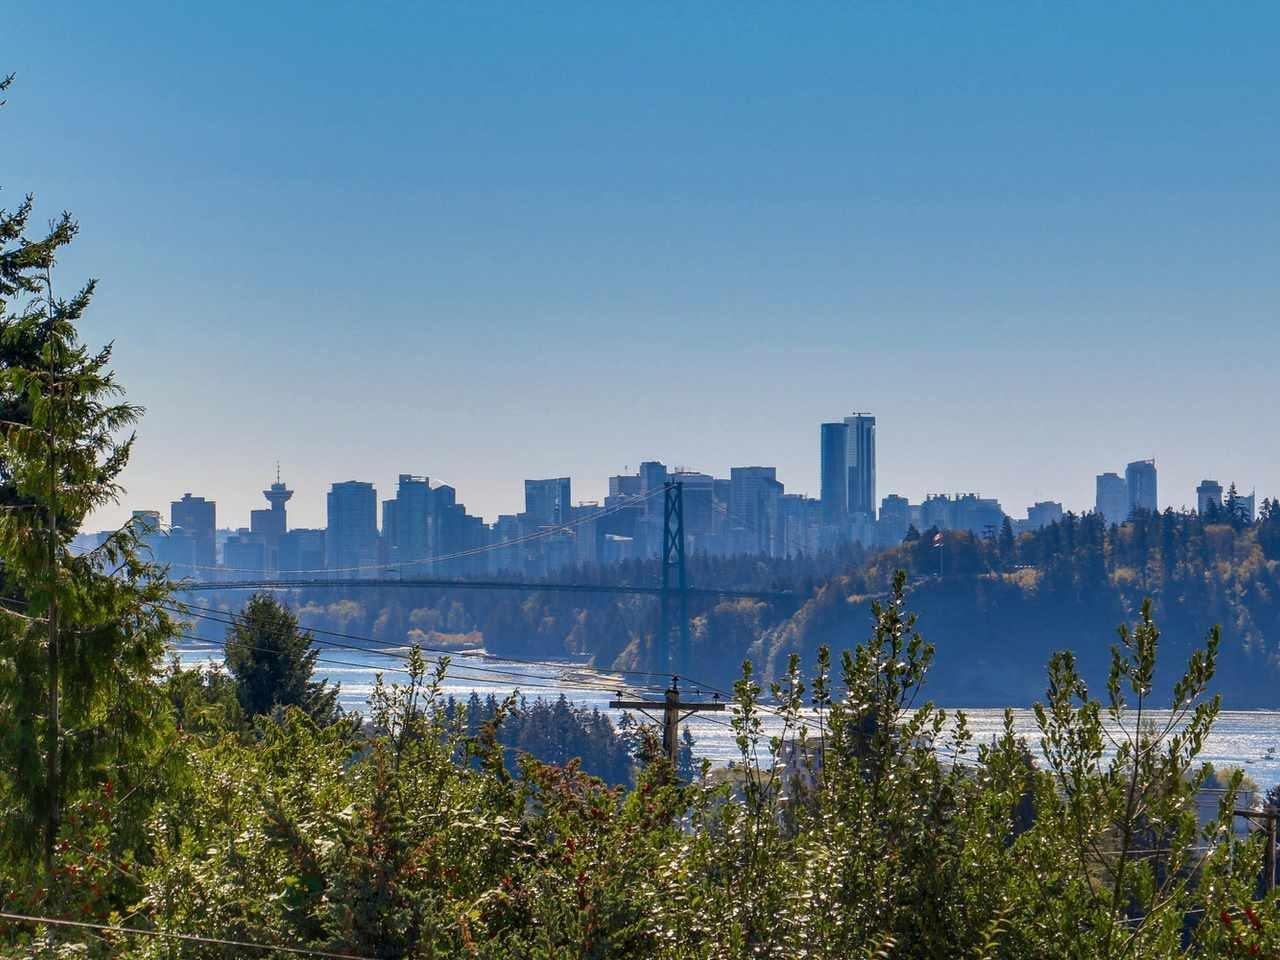 R2123184 - 1517 LAWSON AVENUE, Ambleside, West Vancouver, BC - House/Single Family